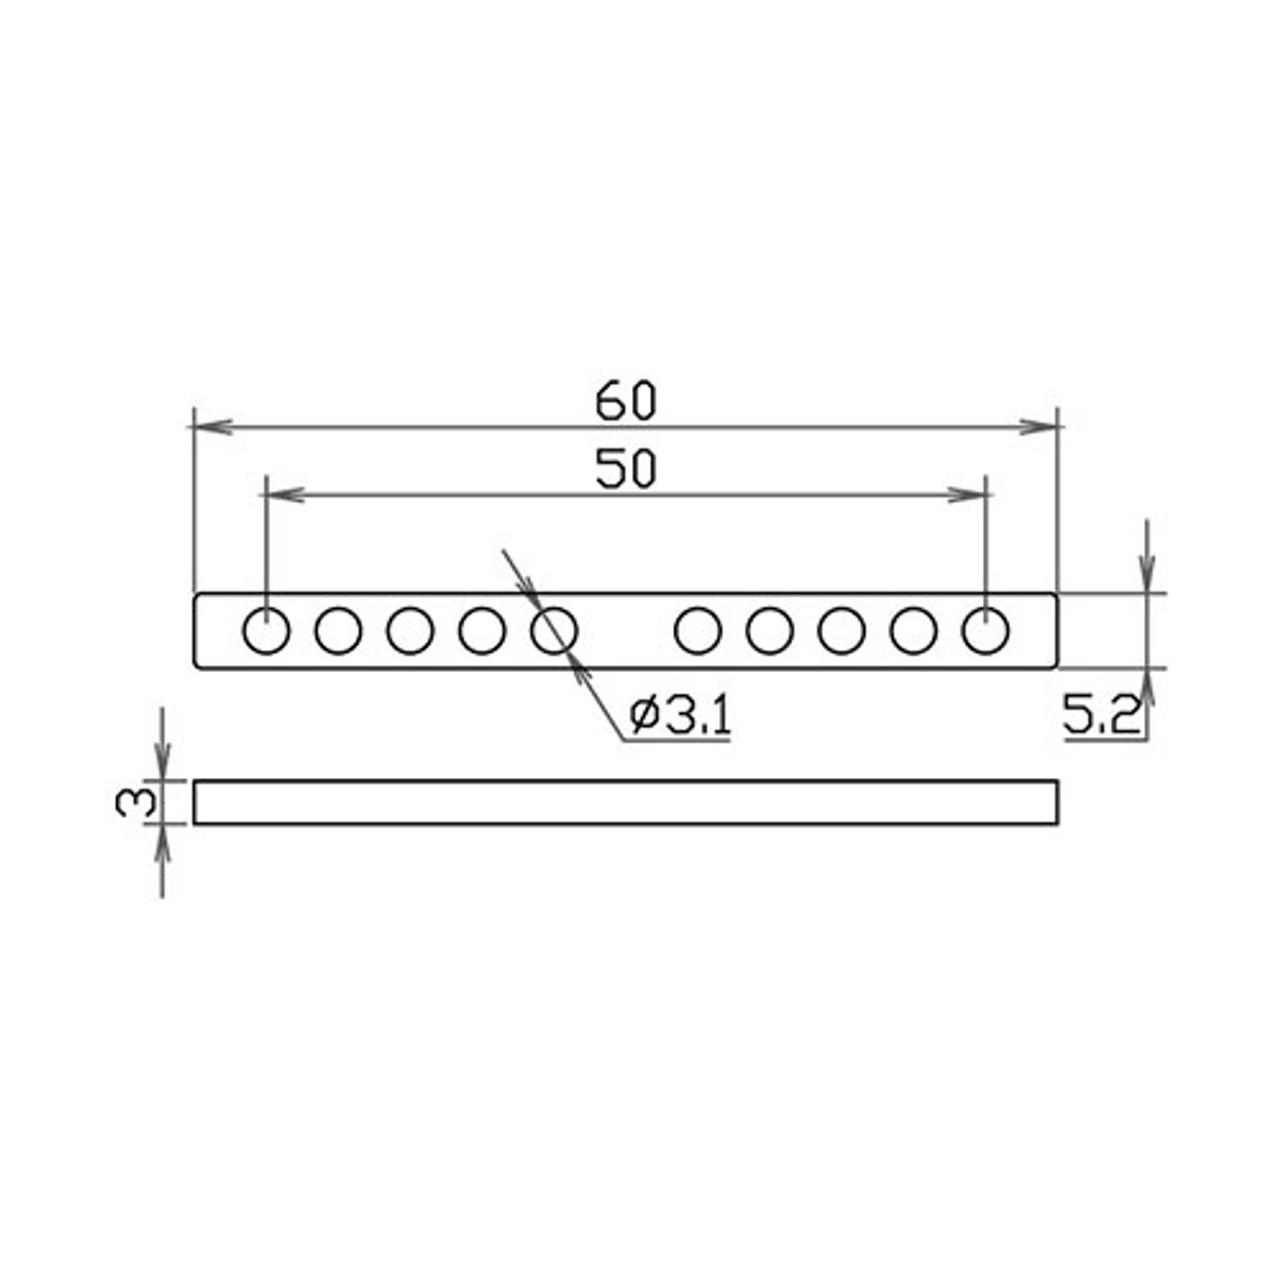 10 Hole Keeper Bar - 50mm